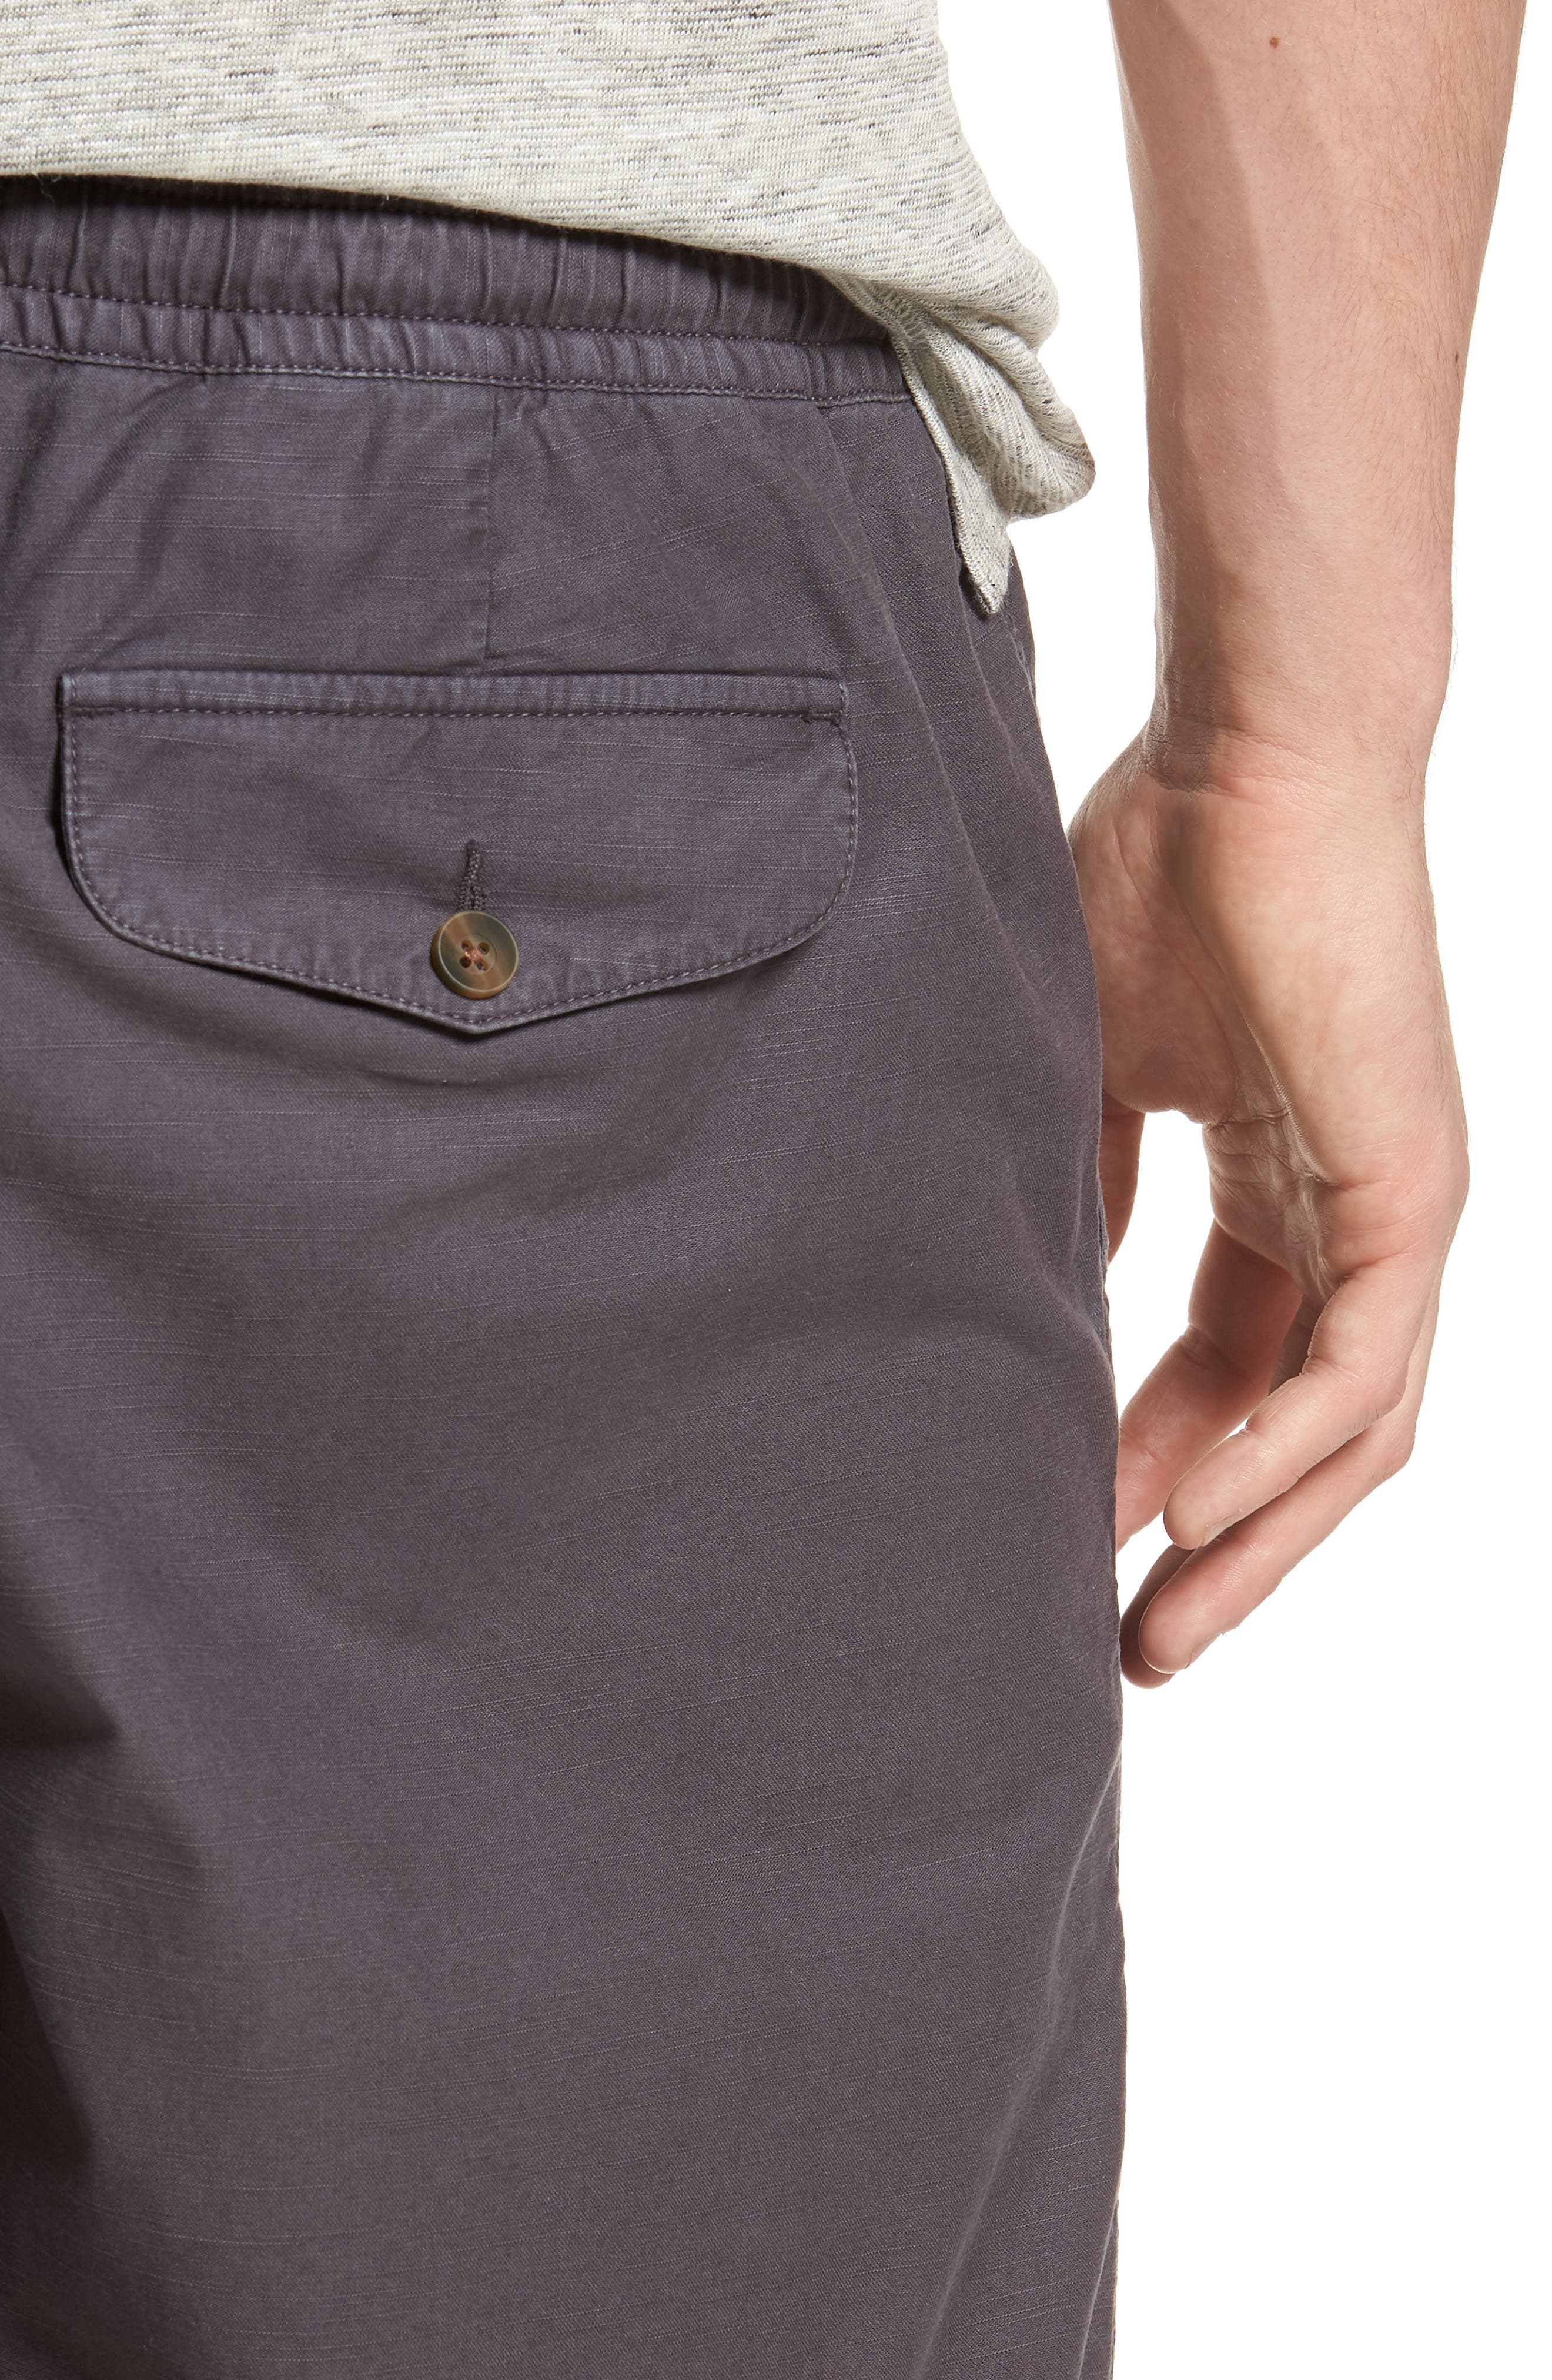 E-Waist Utility Shorts,                             Alternate thumbnail 4, color,                             021